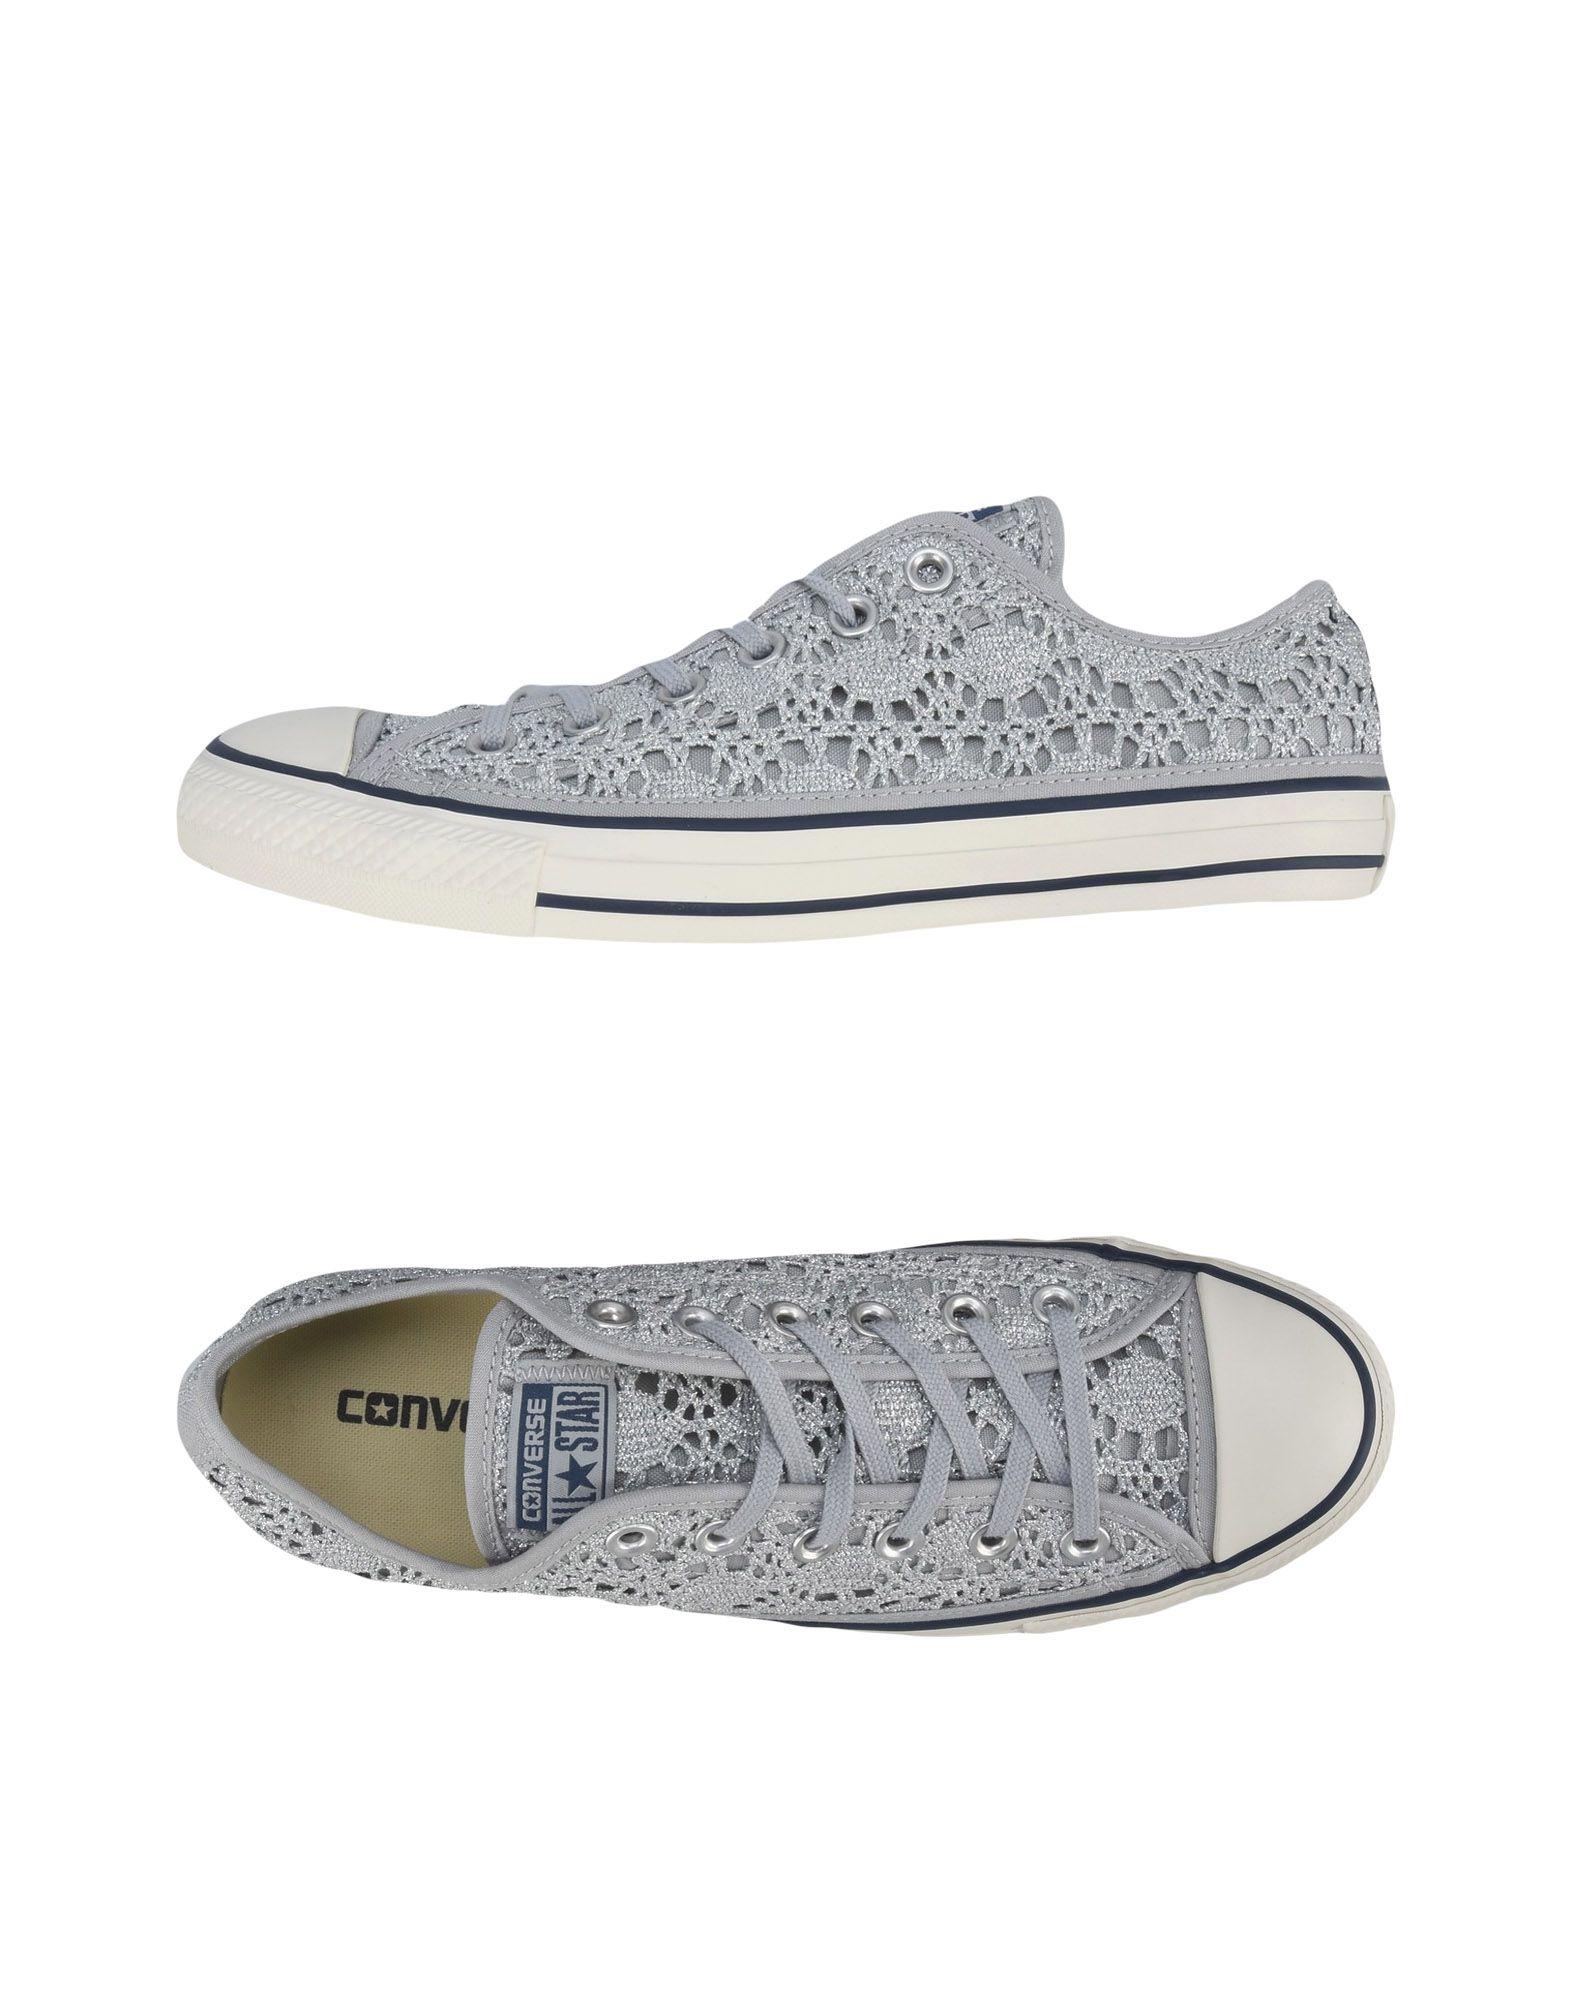 CONVERSE ALL STAR Damen Low Sneakers & Tennisschuhe Farbe Grau Größe 5